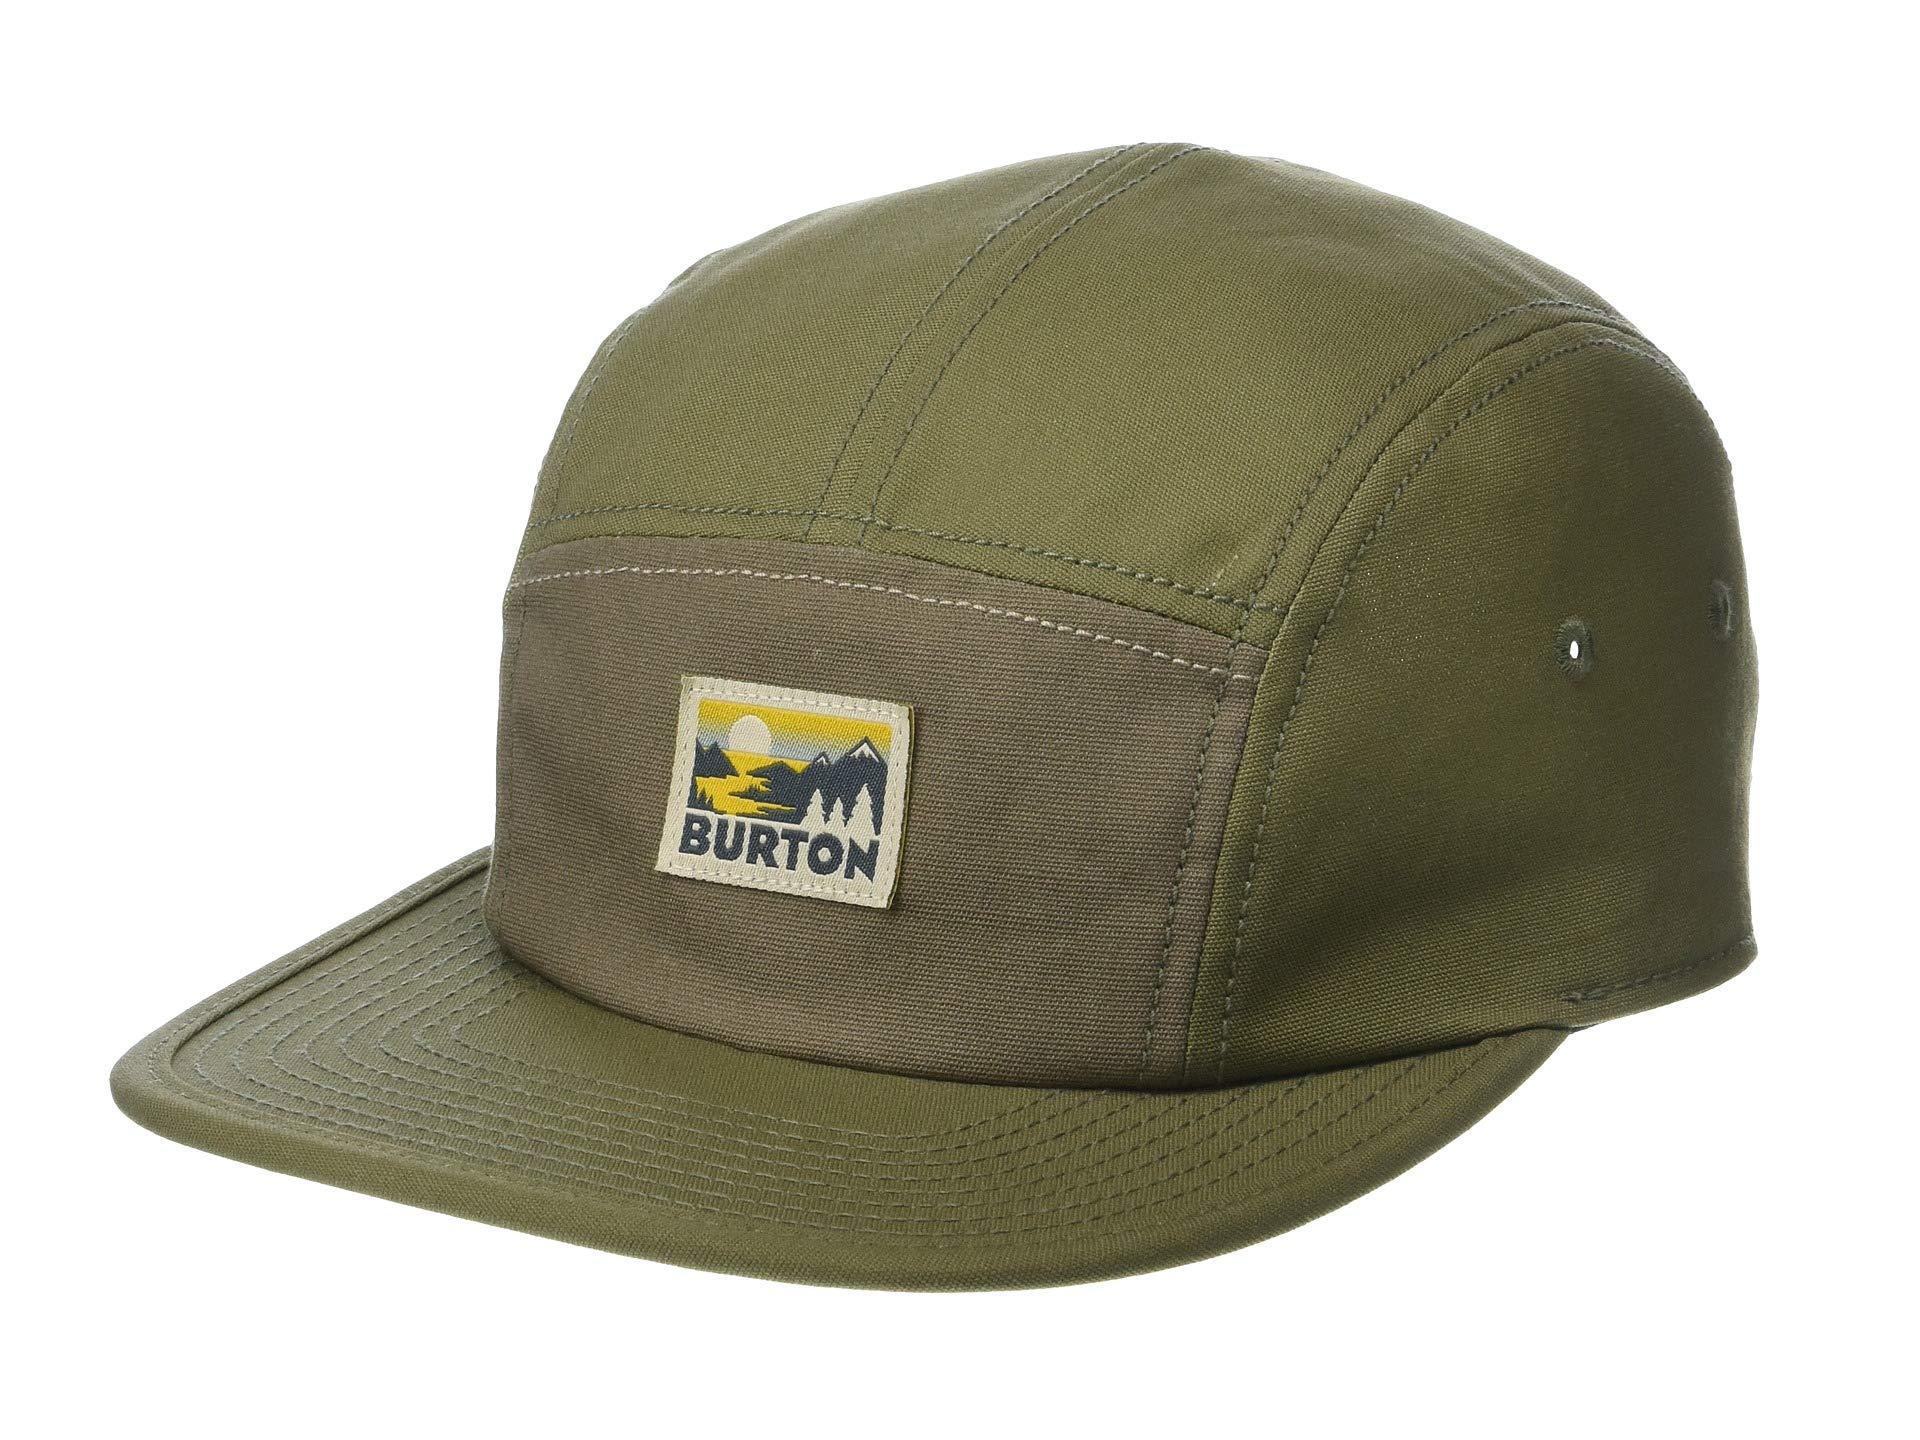 ef9961b29f2 Lyst - Burton Cordova 5 Panel Hat (mood Indigo) Caps in Green for Men